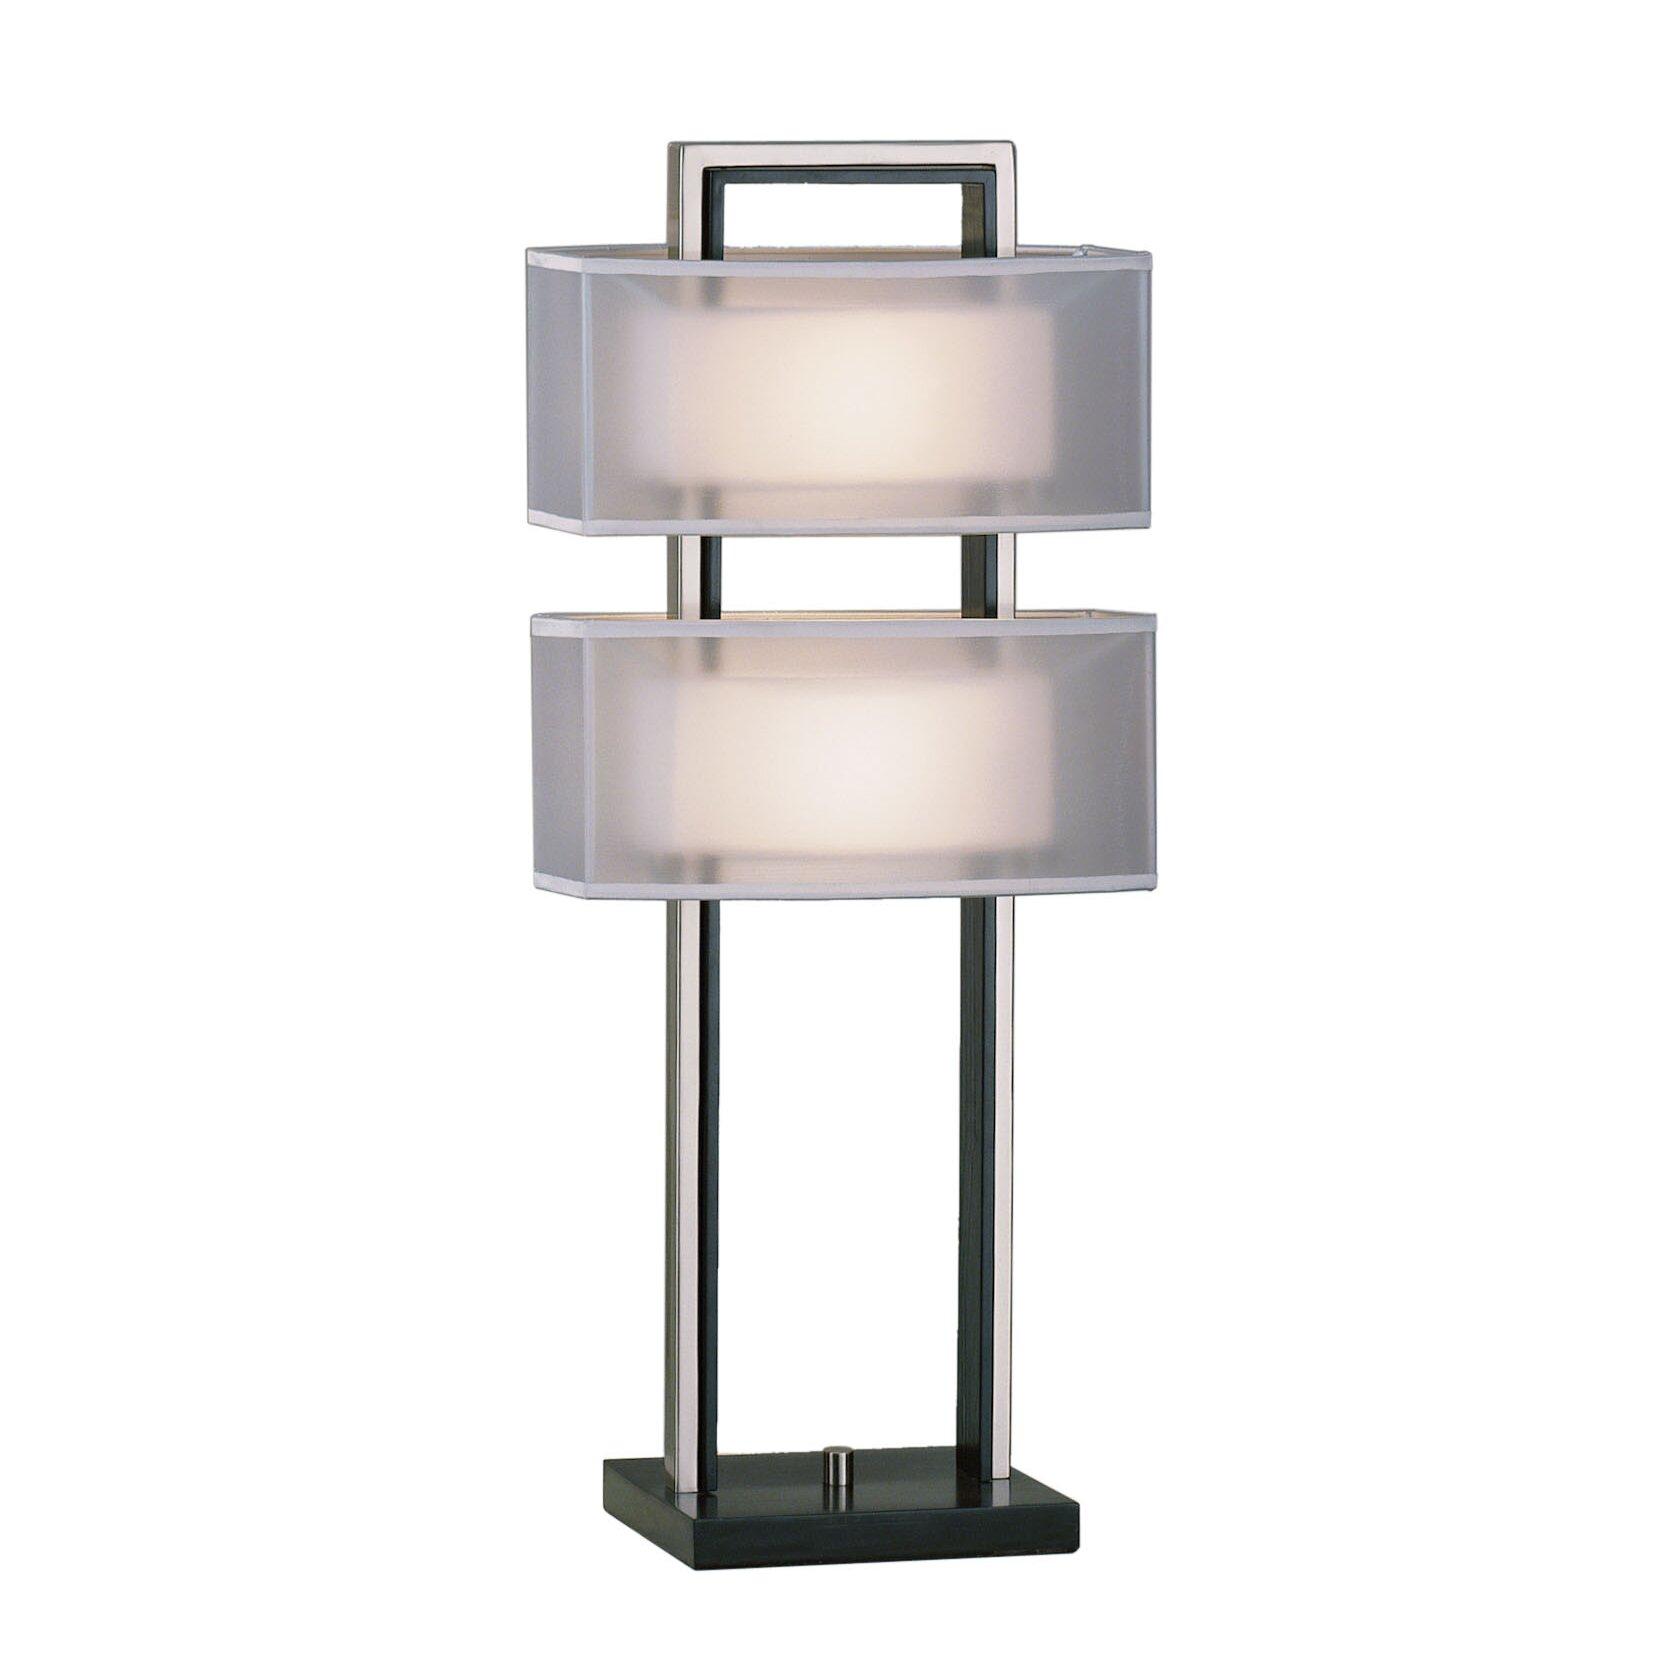 ... Patio Shop Amarillo By Nova Amarillo 28 Quot H Table Lamp With  Rectangular Shade ...